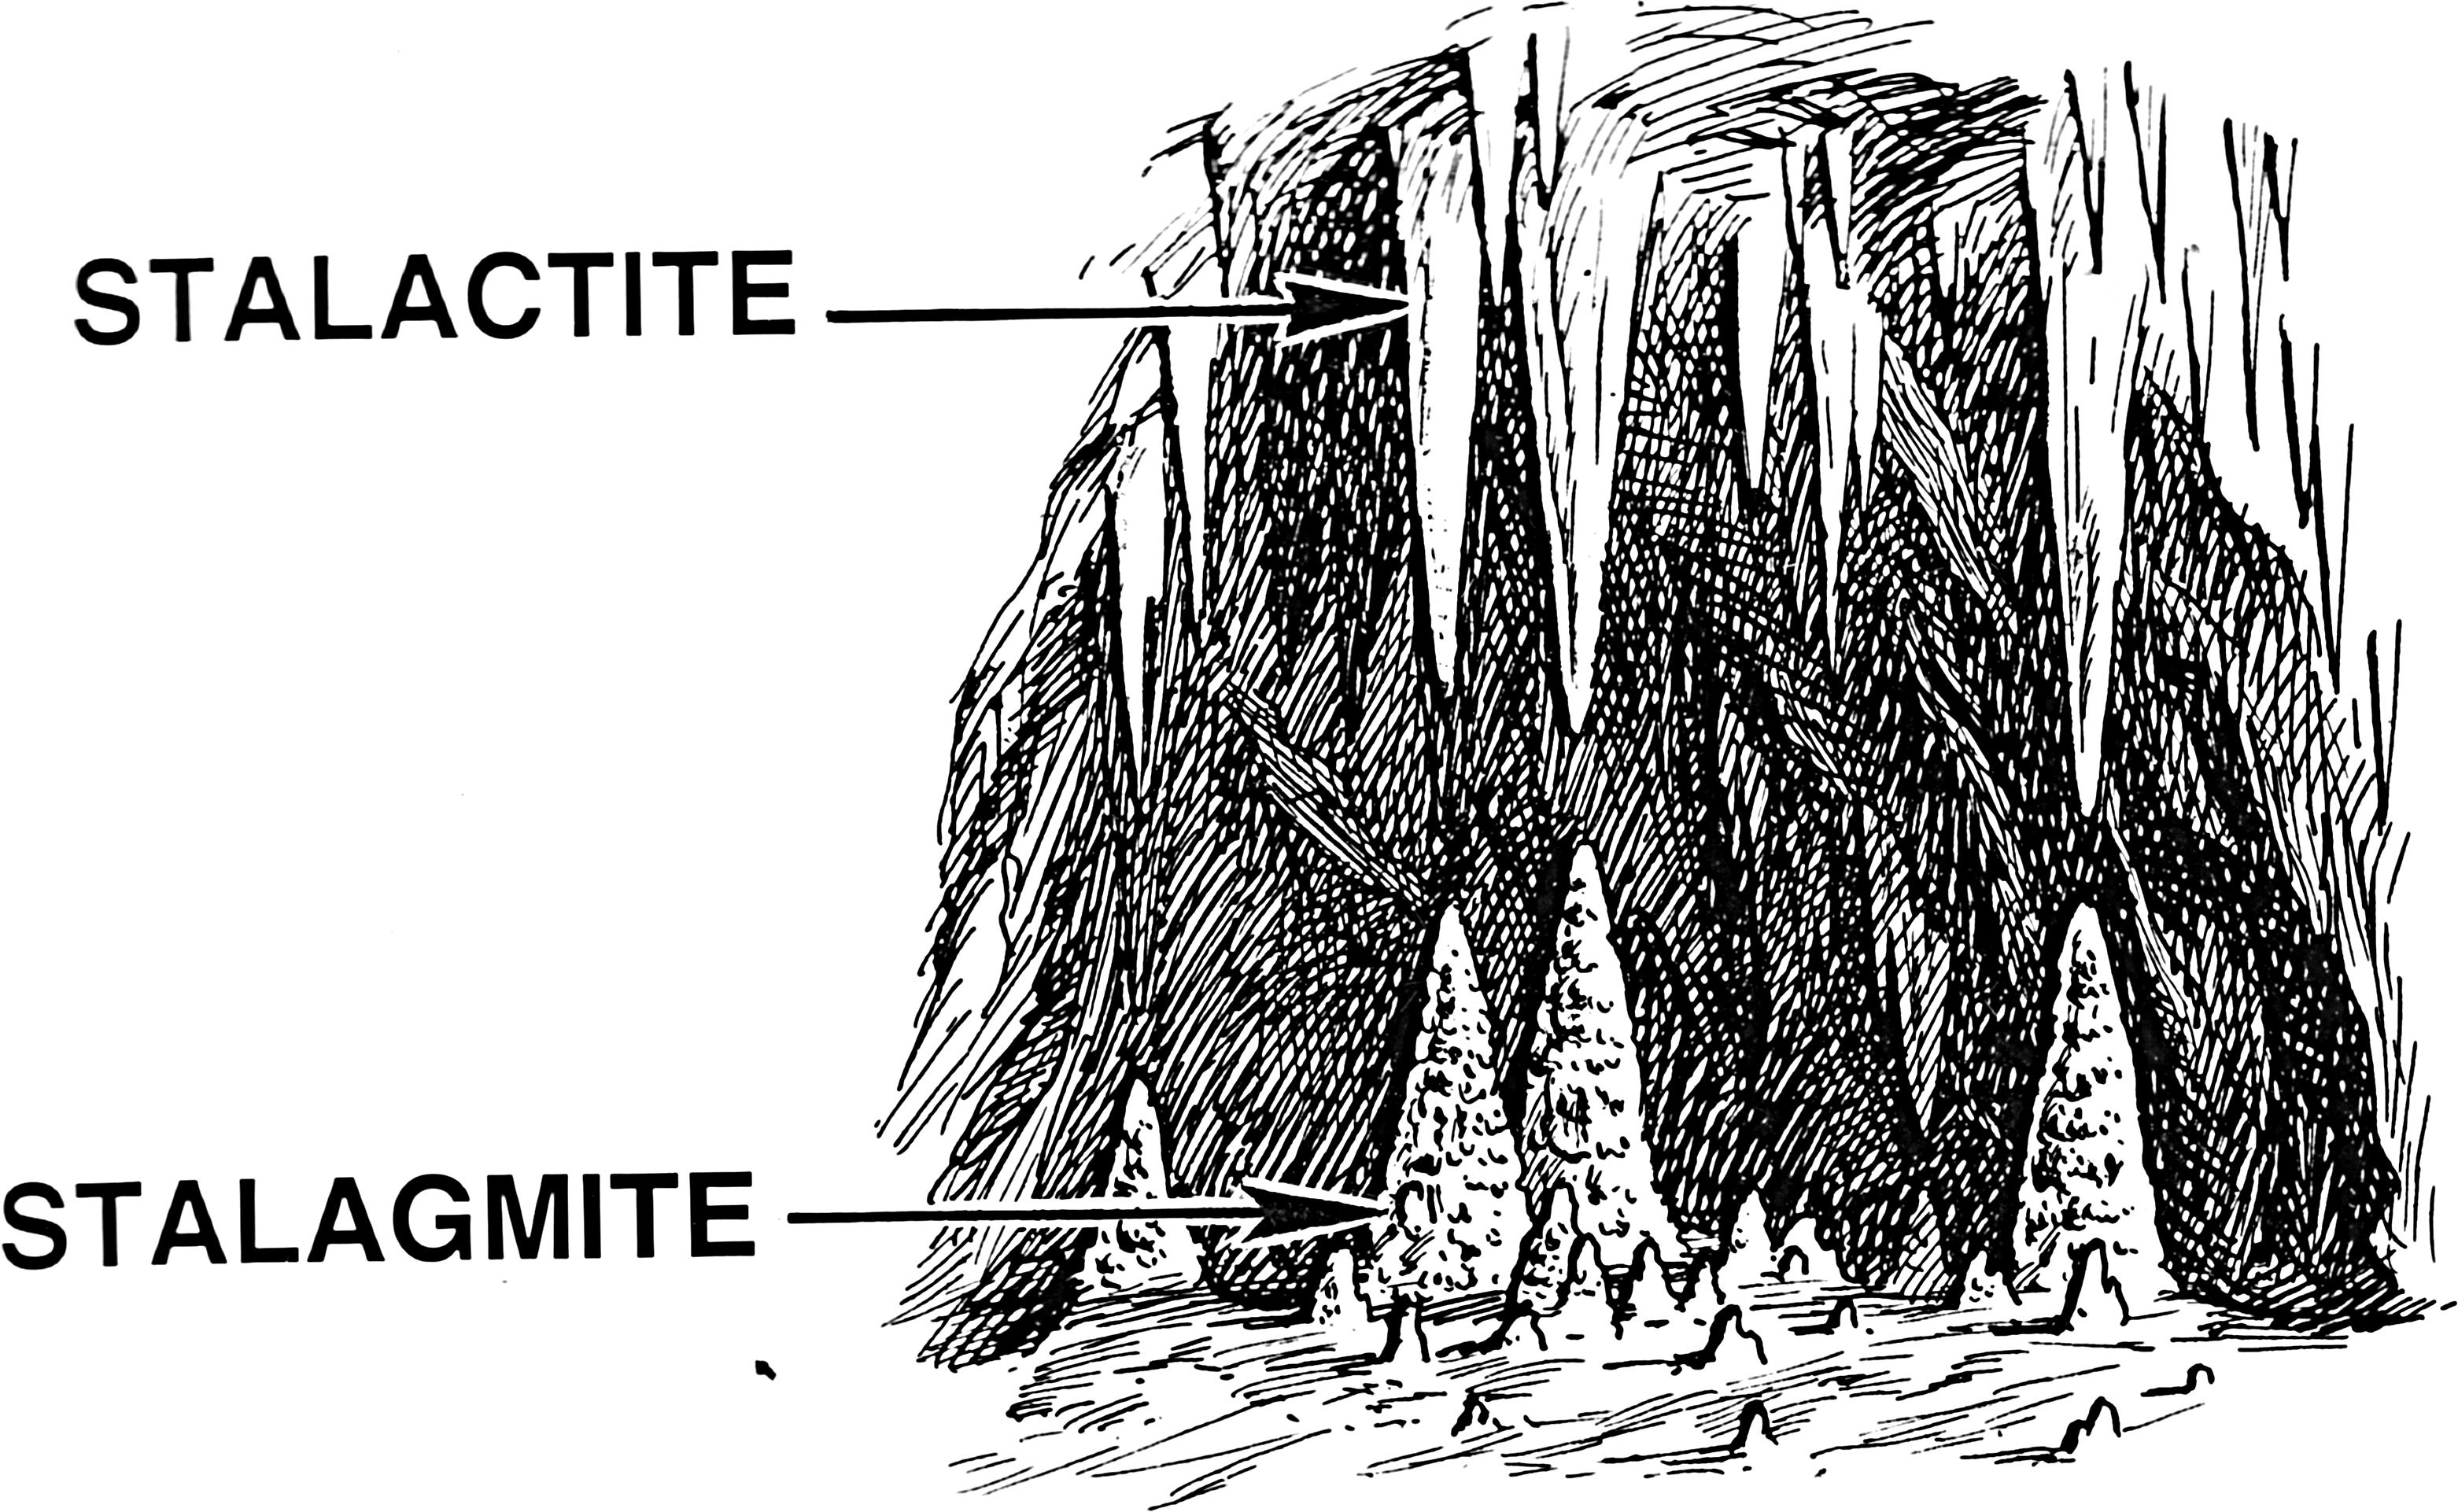 rencontre stalactite et stalagmite)